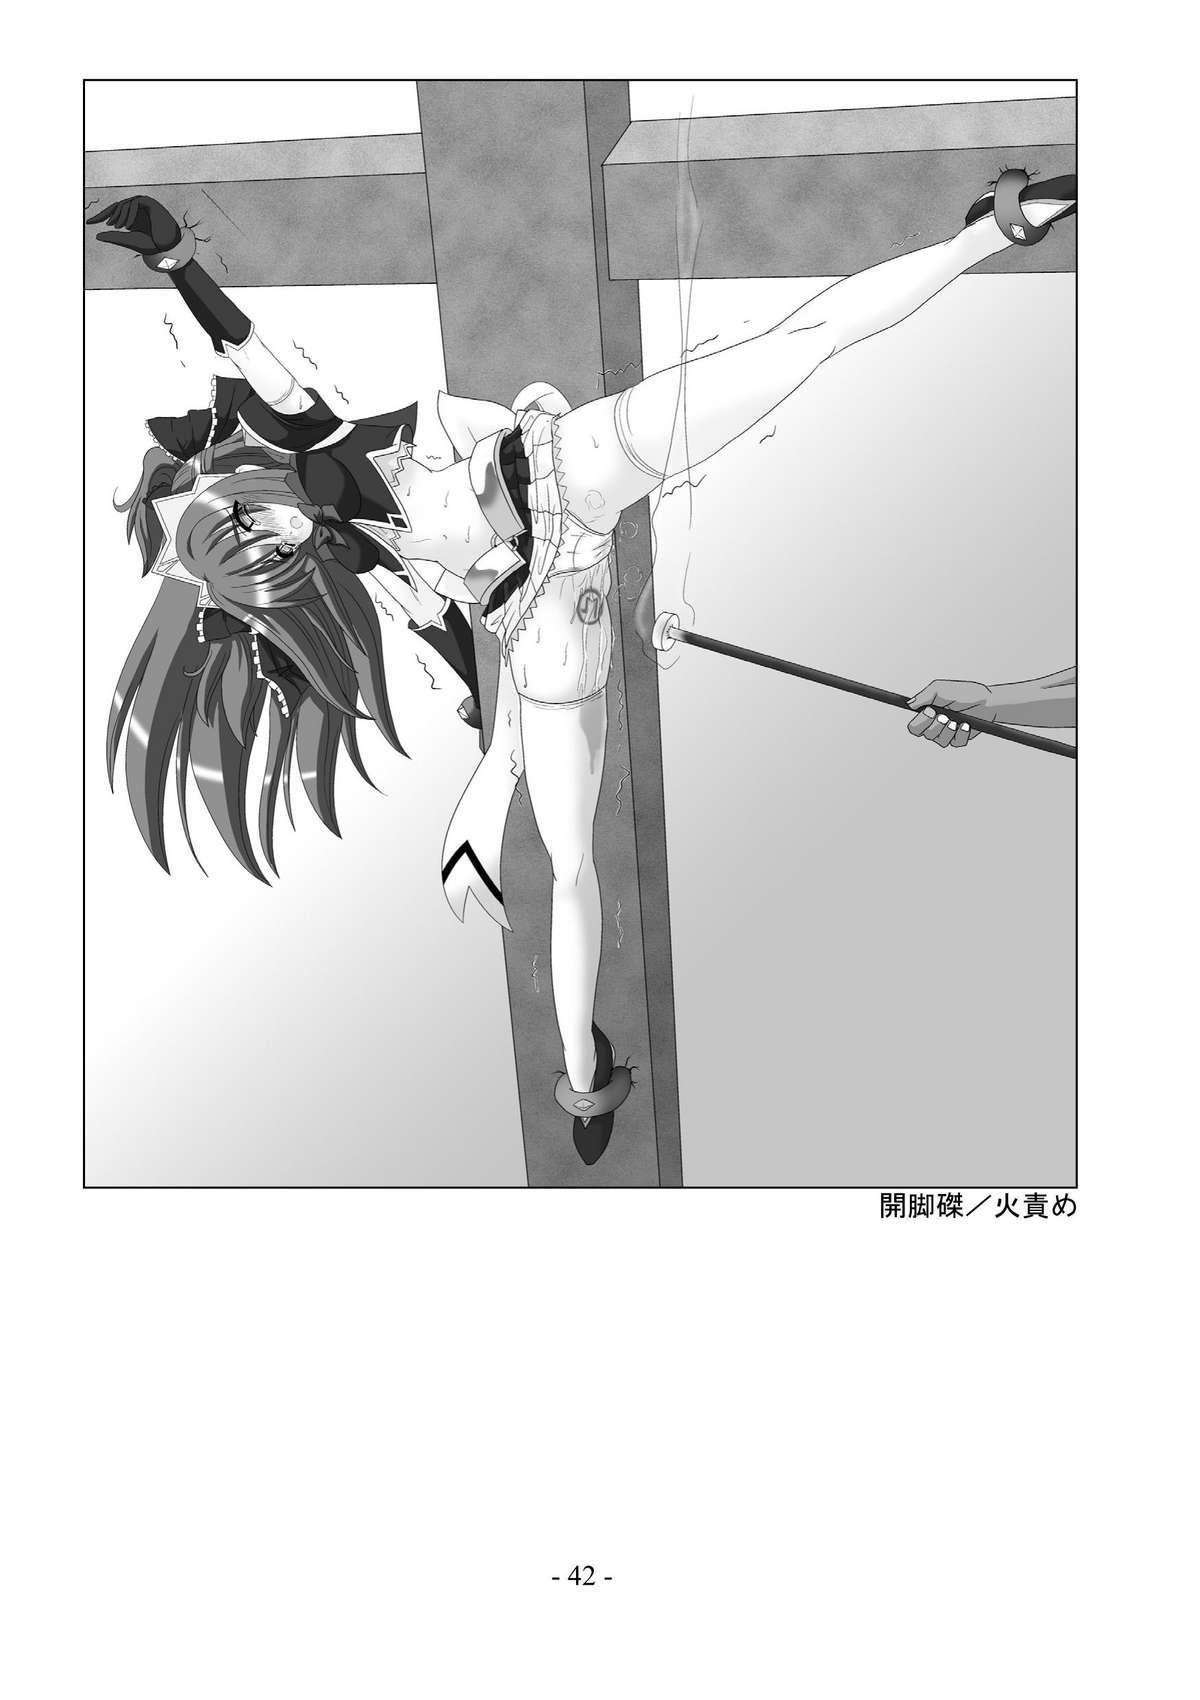 encyclopedia of crucifixion 42